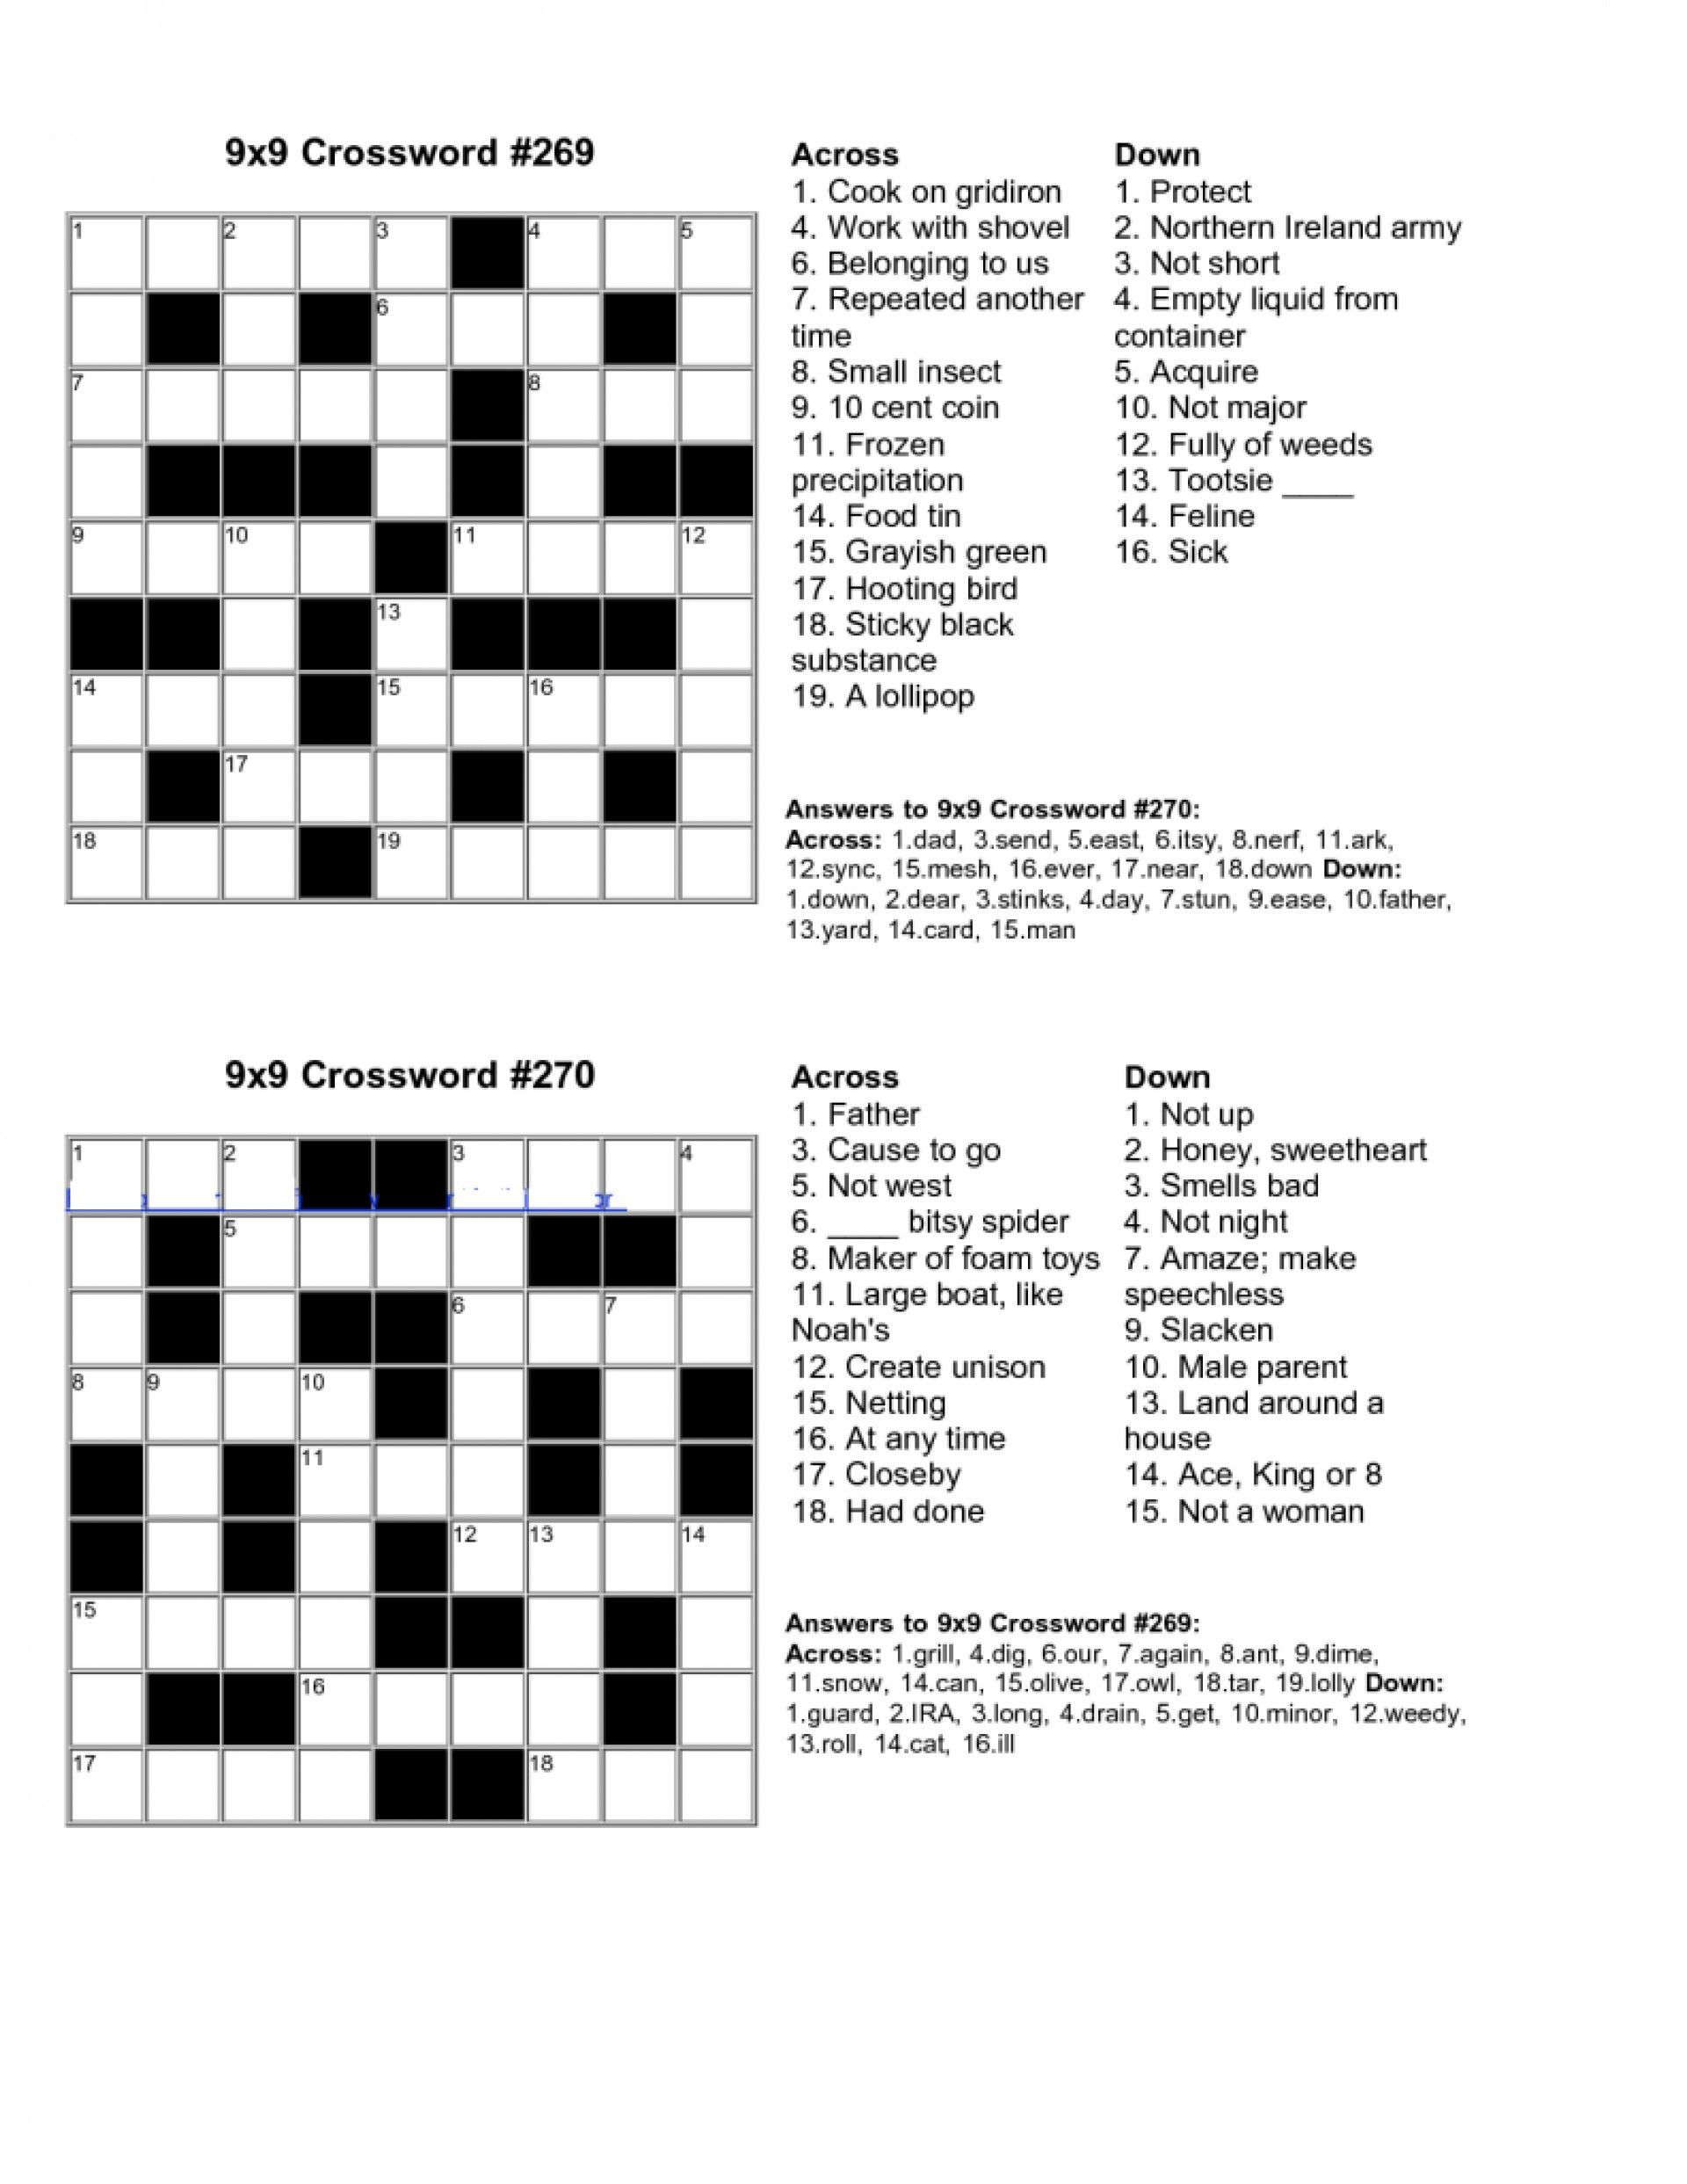 Free Crossword Puzzle Maker Printable - Stepindance.fr - Create A - Free Crossword Puzzle Maker Printable